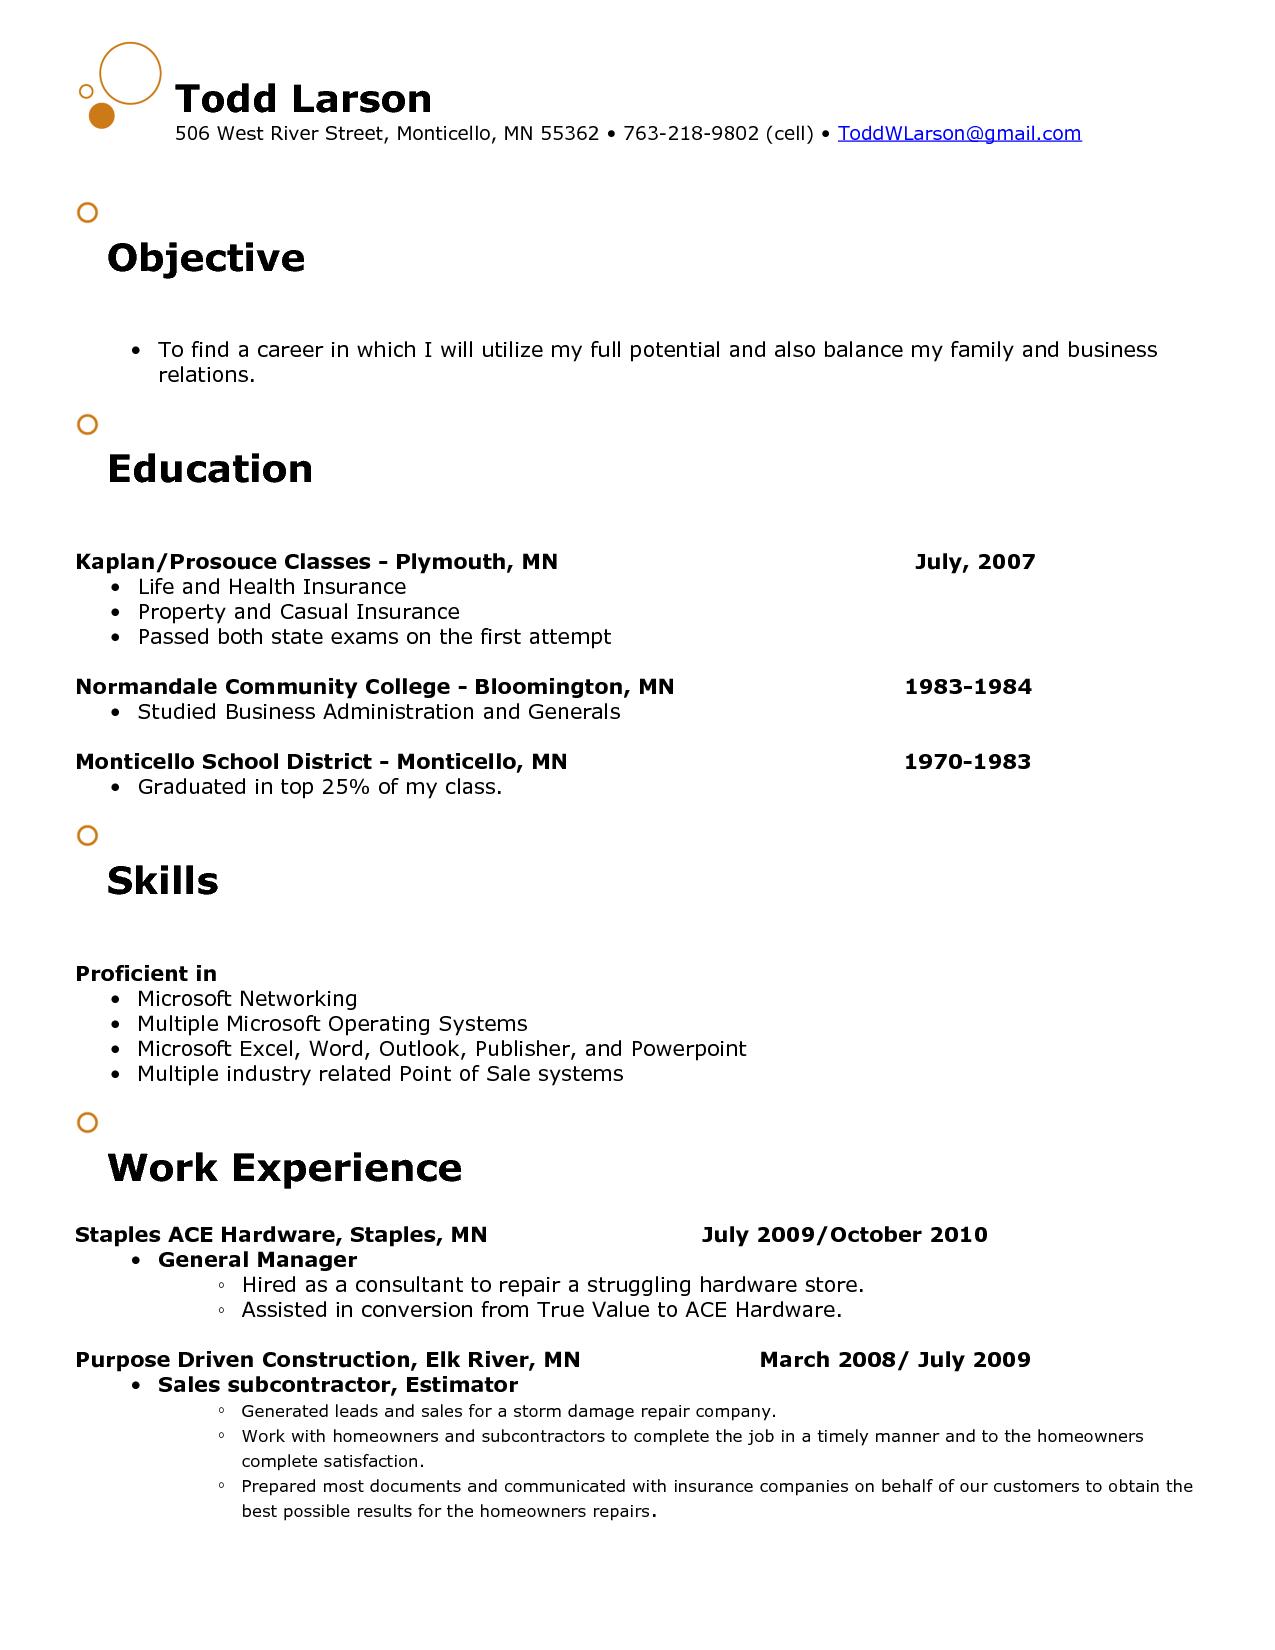 21 free sample resume objective